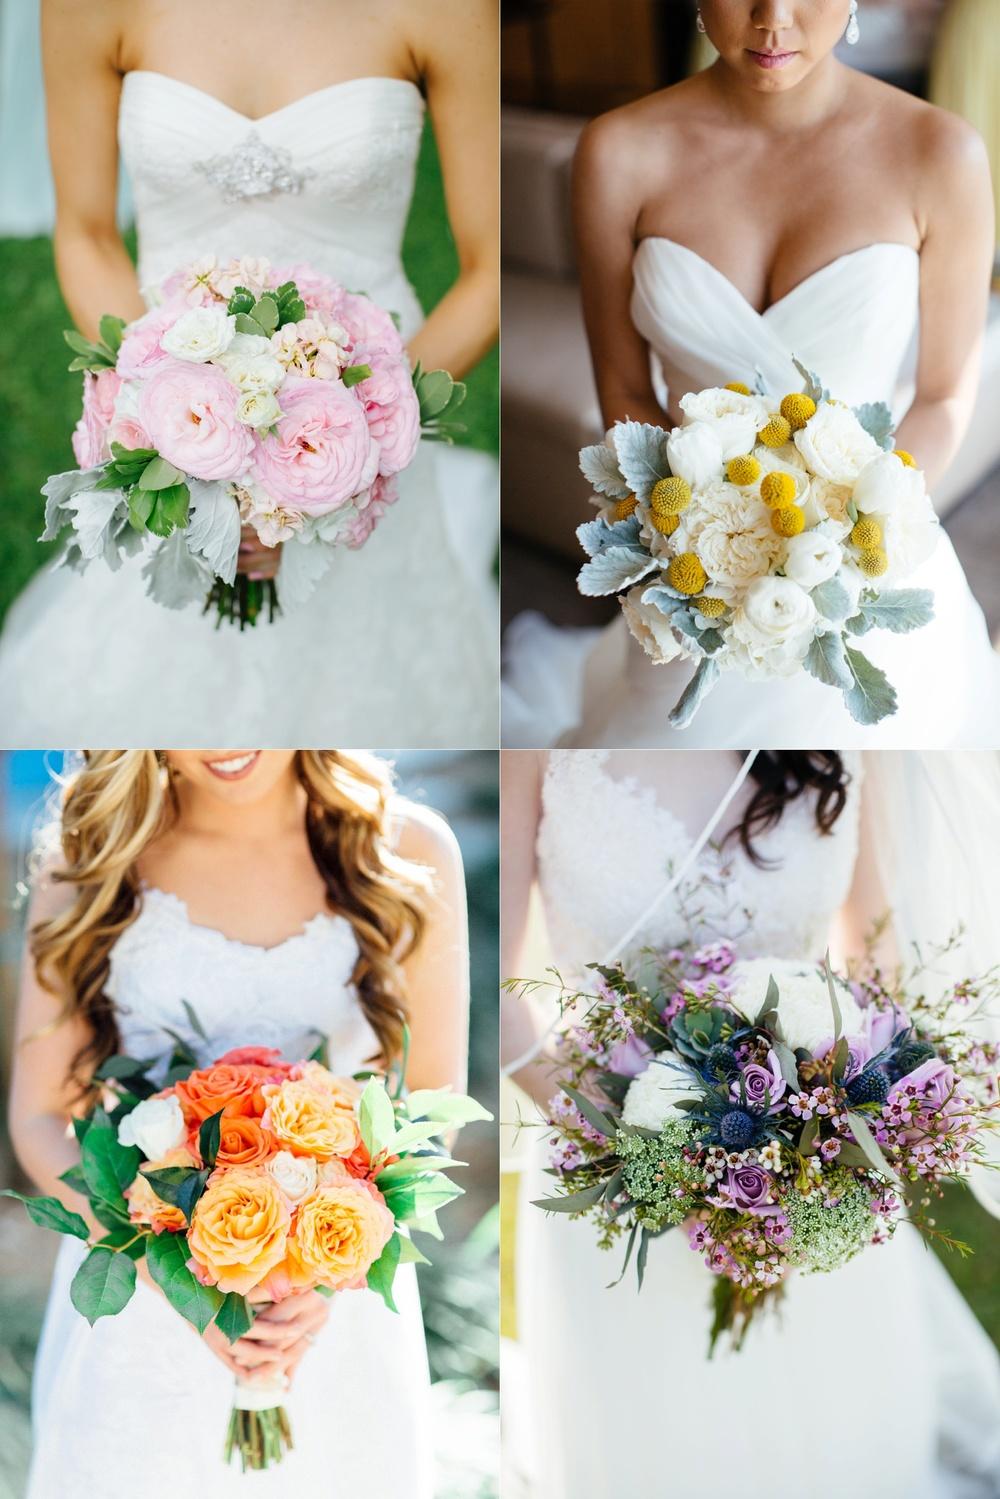 jake-and-katie-wedding-favorites-2015-14_01